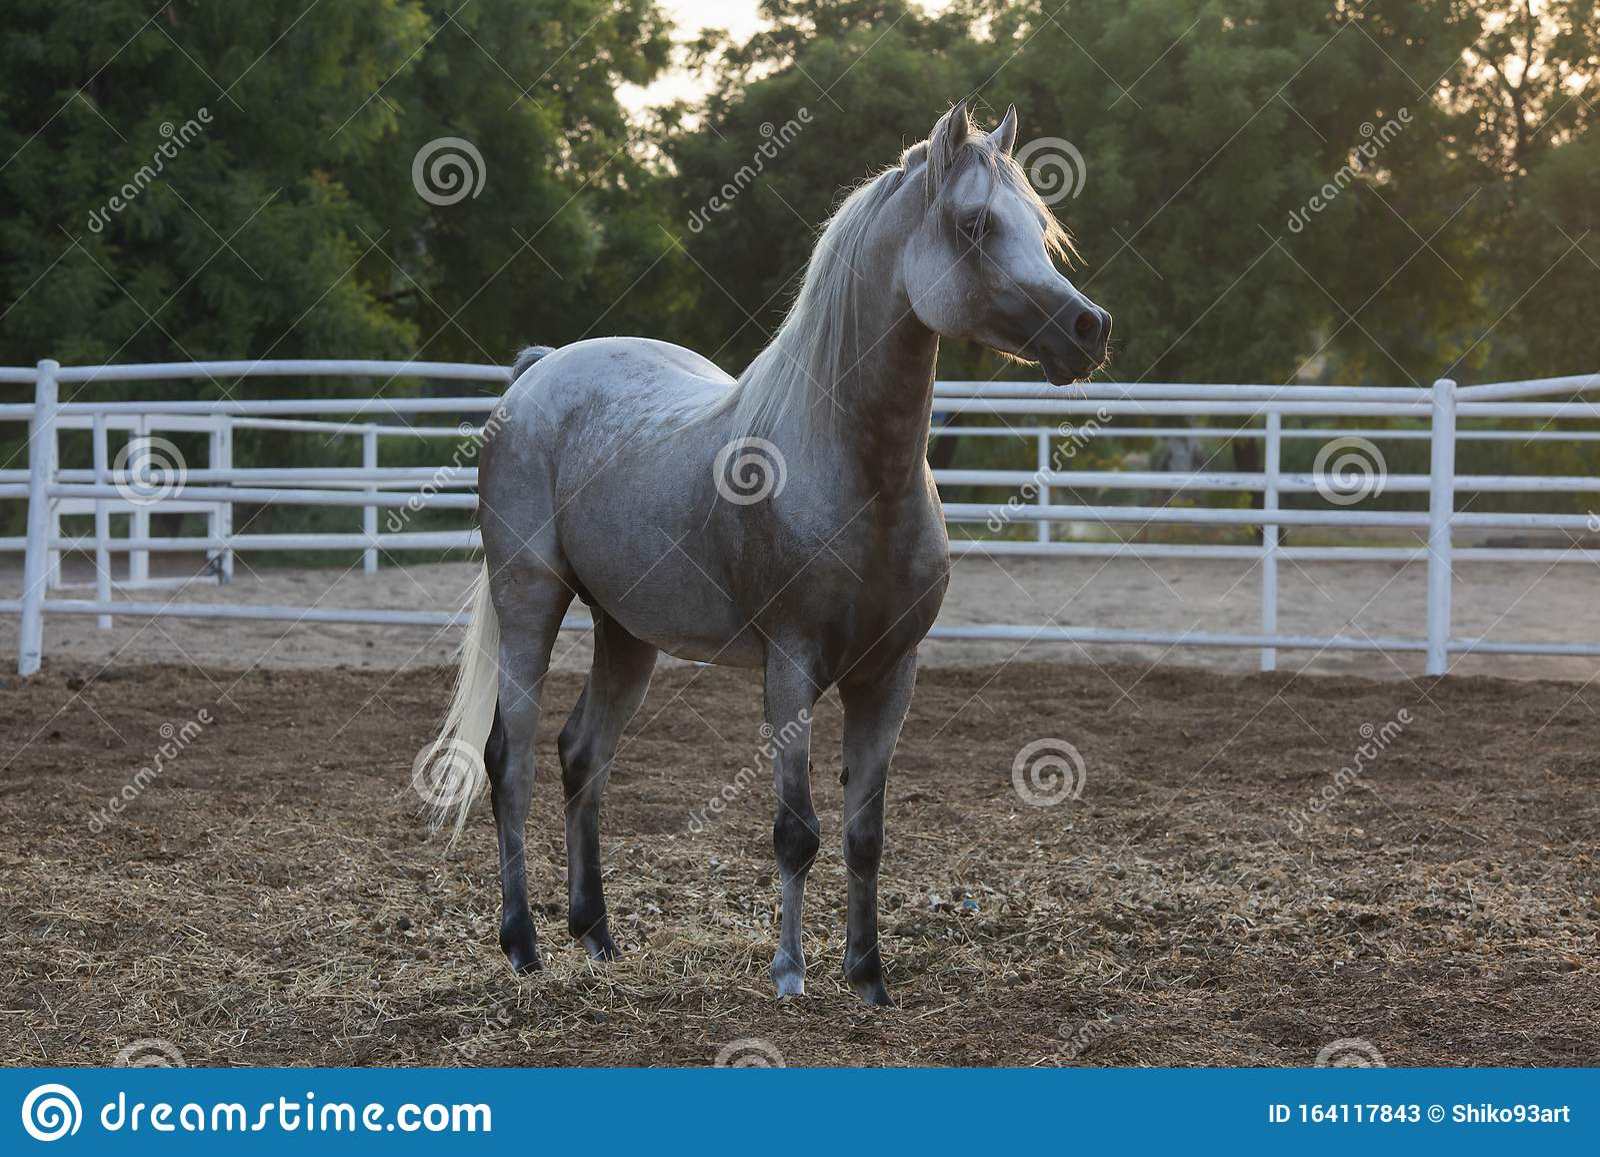 Lovely Arabian White Horse Dubai Stock Image Image Of Dubai White 164117843